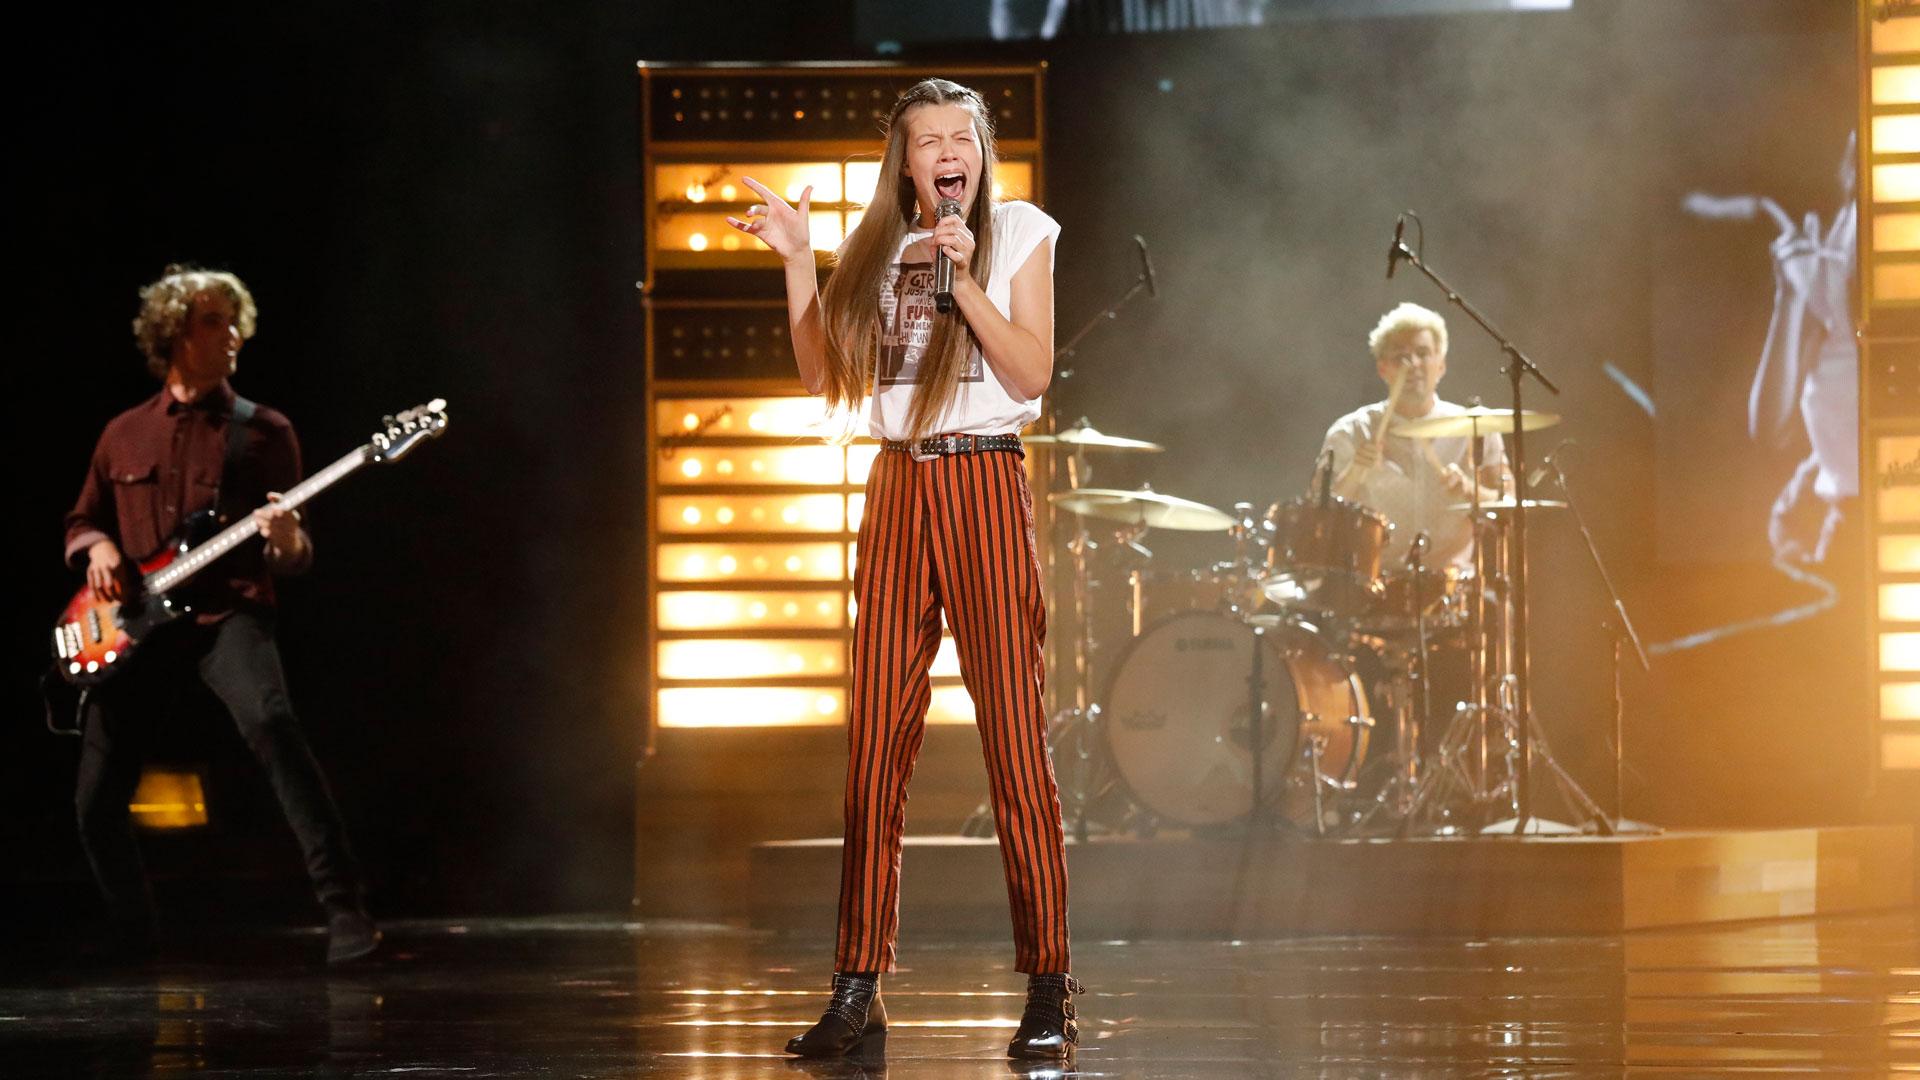 Watch Americas Got Talent Episode: Live Results 1 - NBC.com